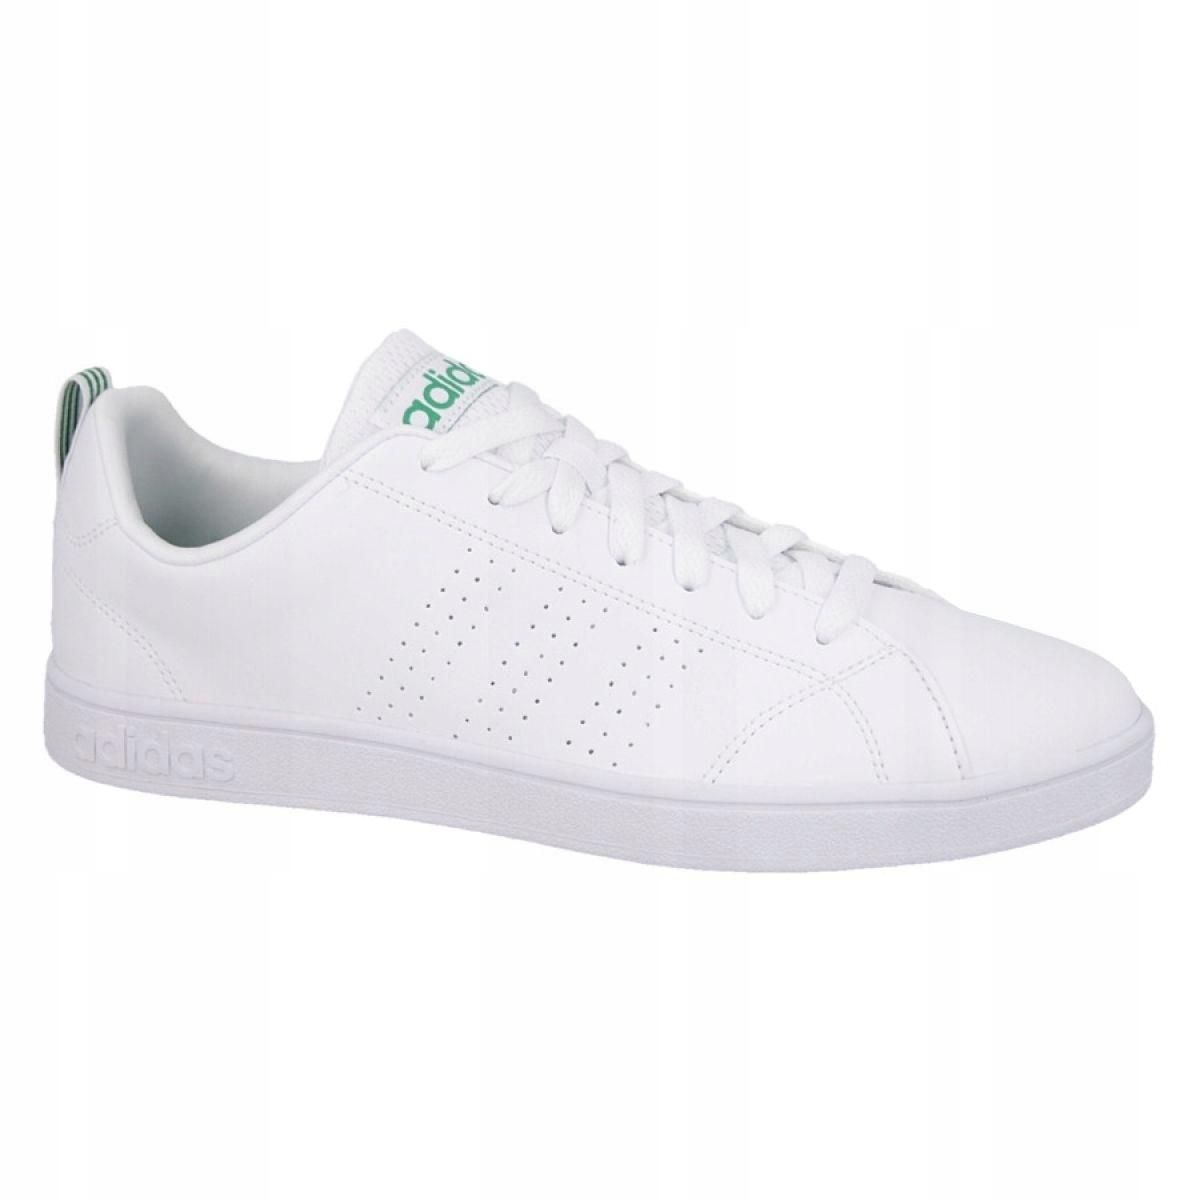 Buty damskie adidas Advantage AW4884 r. 38 7557944136